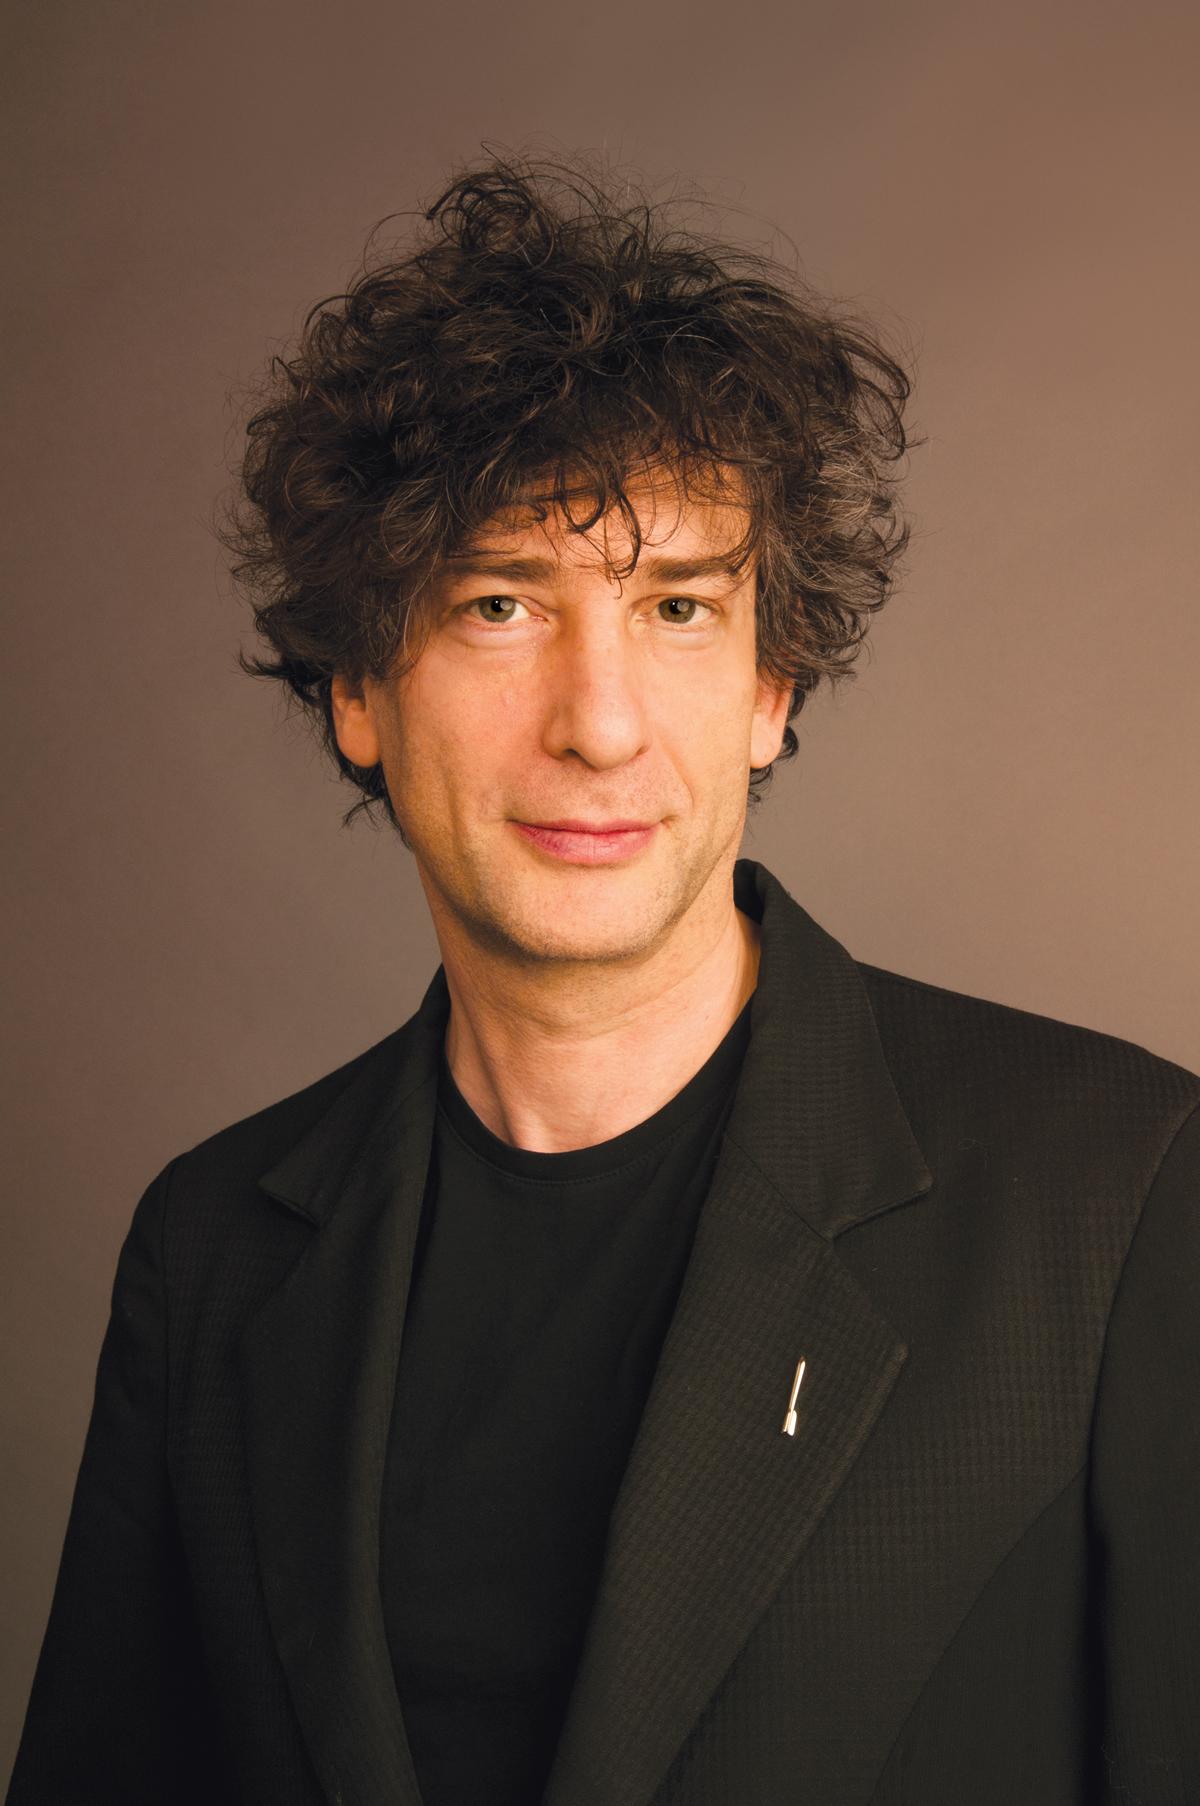 Neil Gaiman Crowd-Sources Poem on Twitter